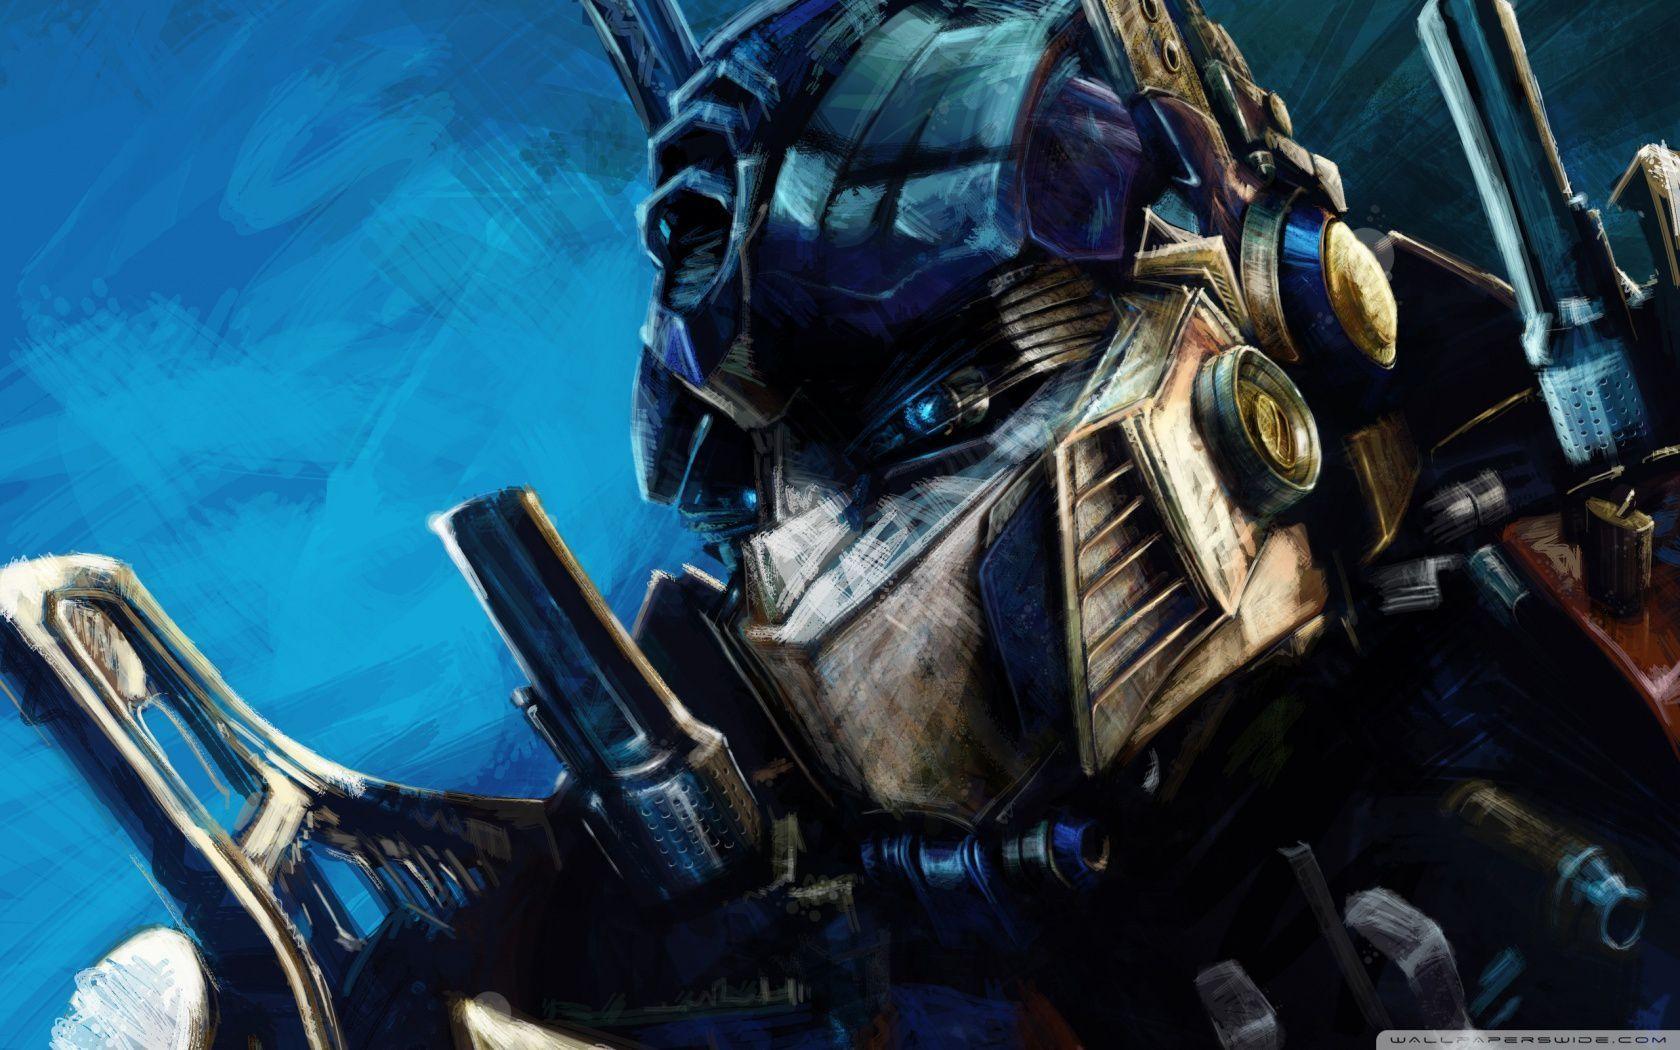 Imagenes De Transformers Tf Optimus Prime Live Action Optimus Prime Artwork Transformers Painting Optimus Prime Wallpaper